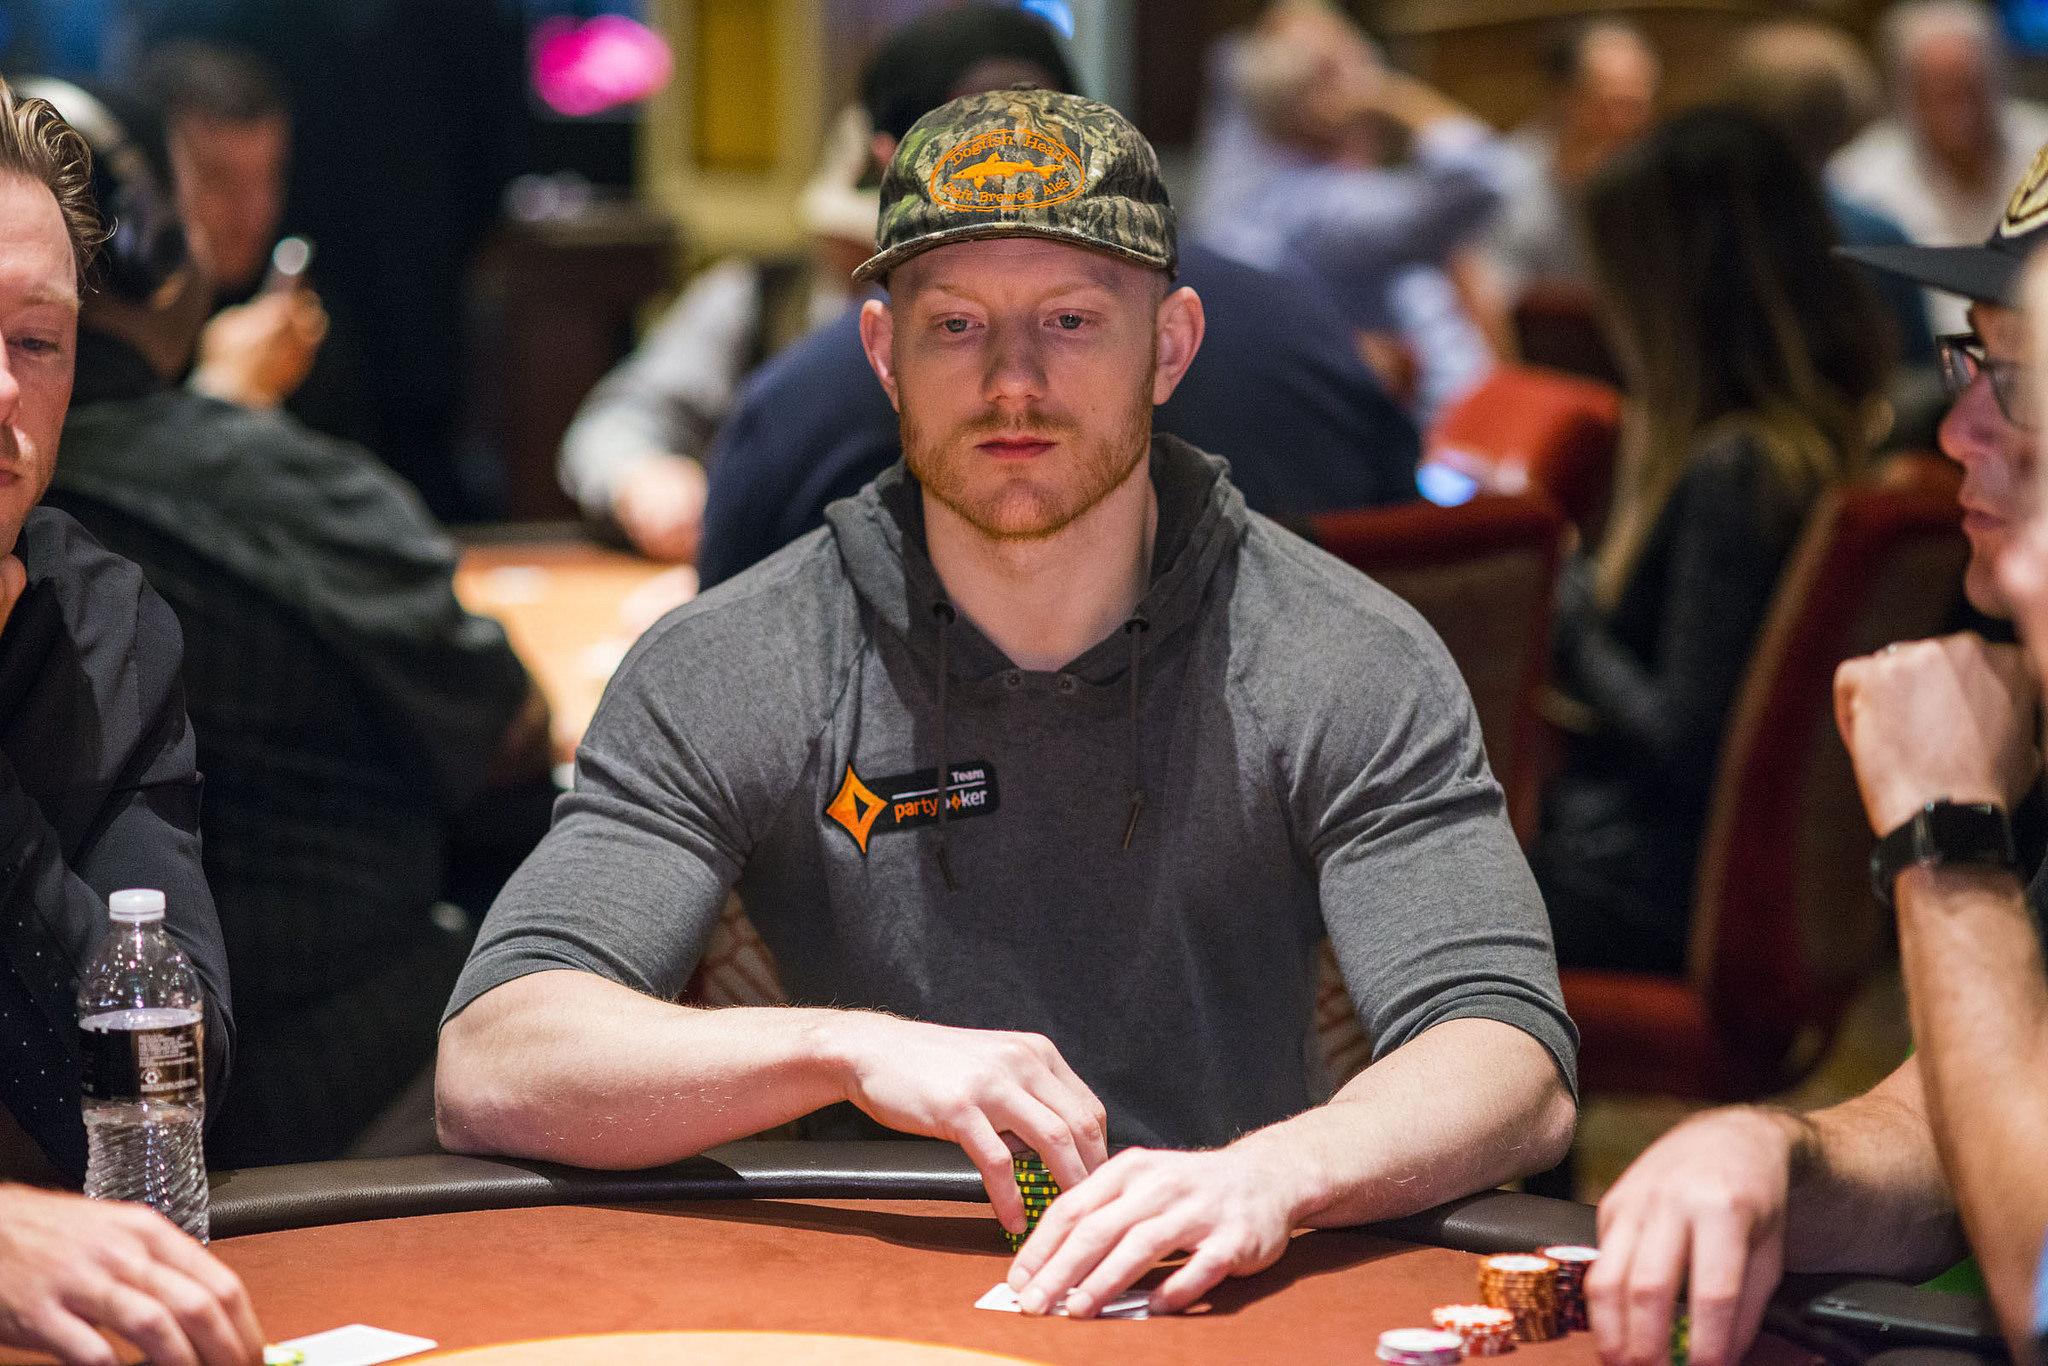 Jason Koon am Pokertisch